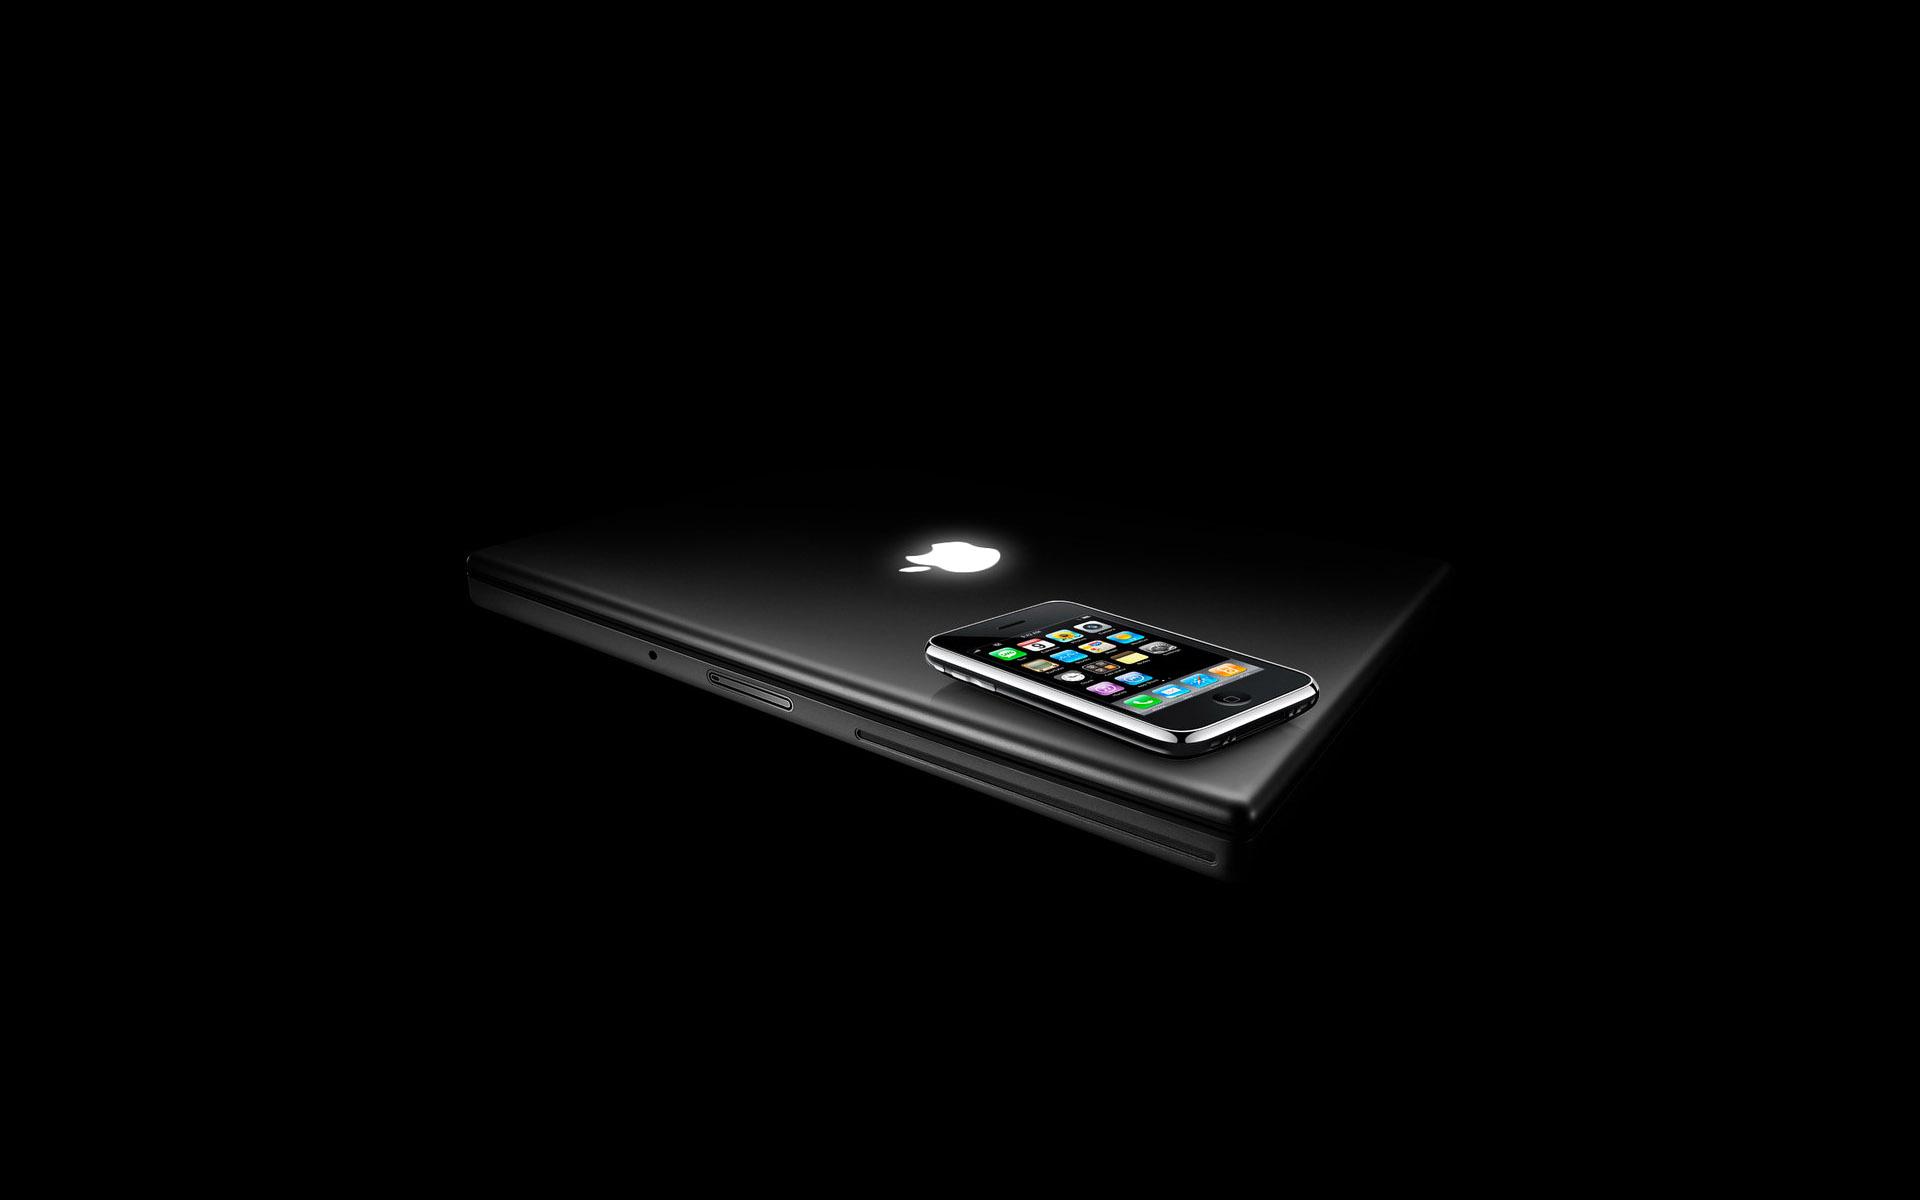 HD Wallpapers Apple iPhone MAC